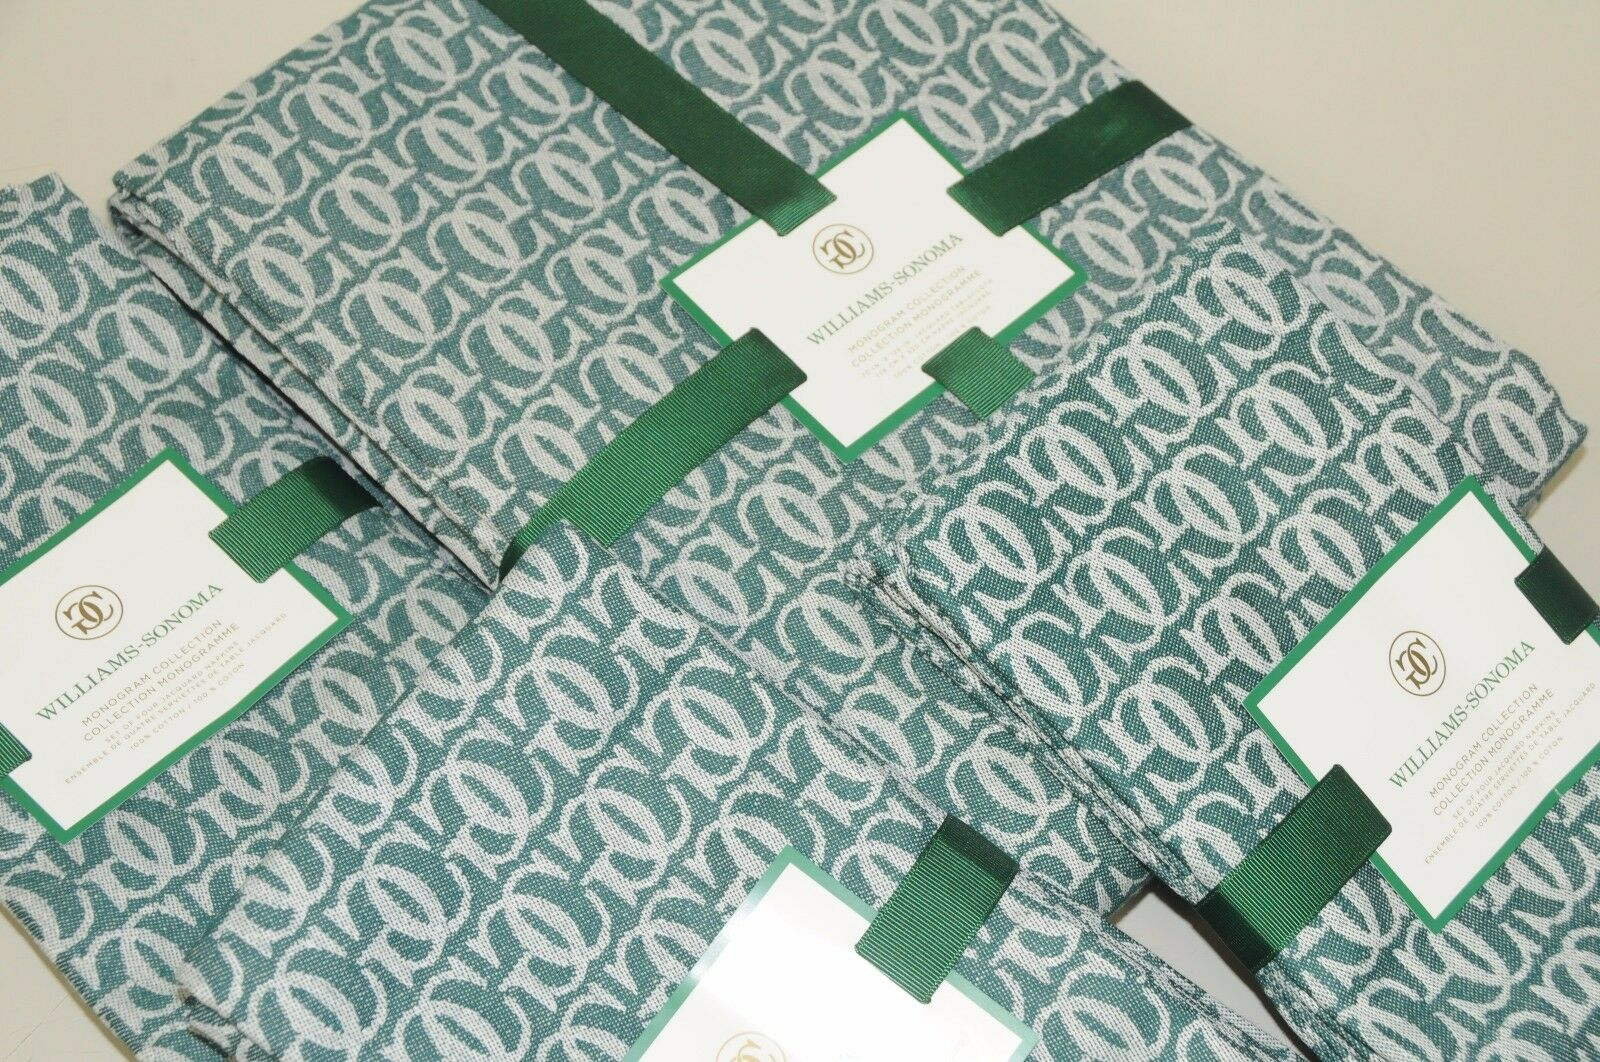 Neuf Williams Sonoma Grande Cuisine Jacquard Nappe 70x126 + 12 Serviette Vert